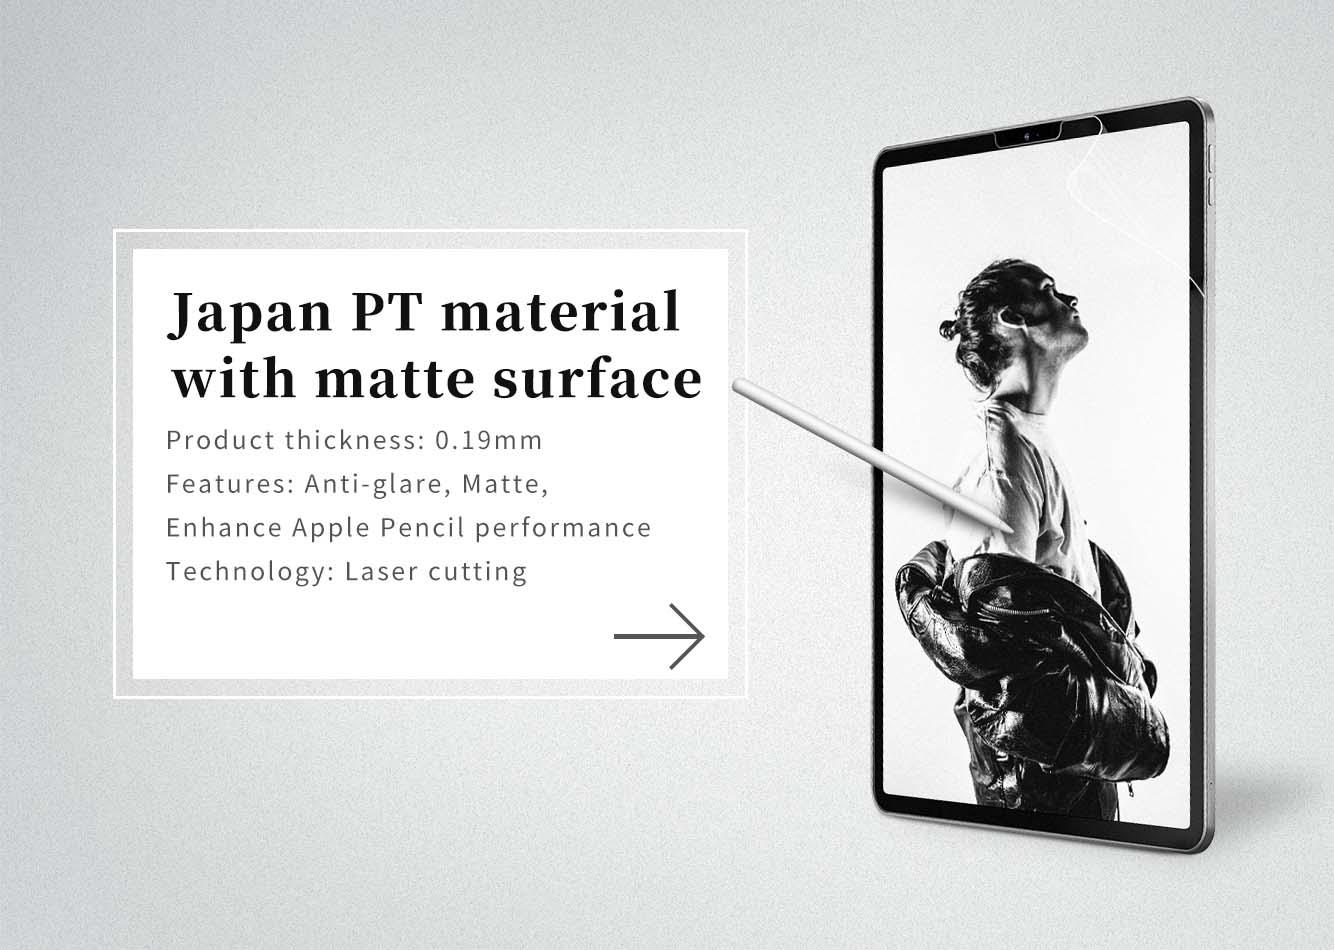 Apple iPad Pro 12.9 (2018) screen protector